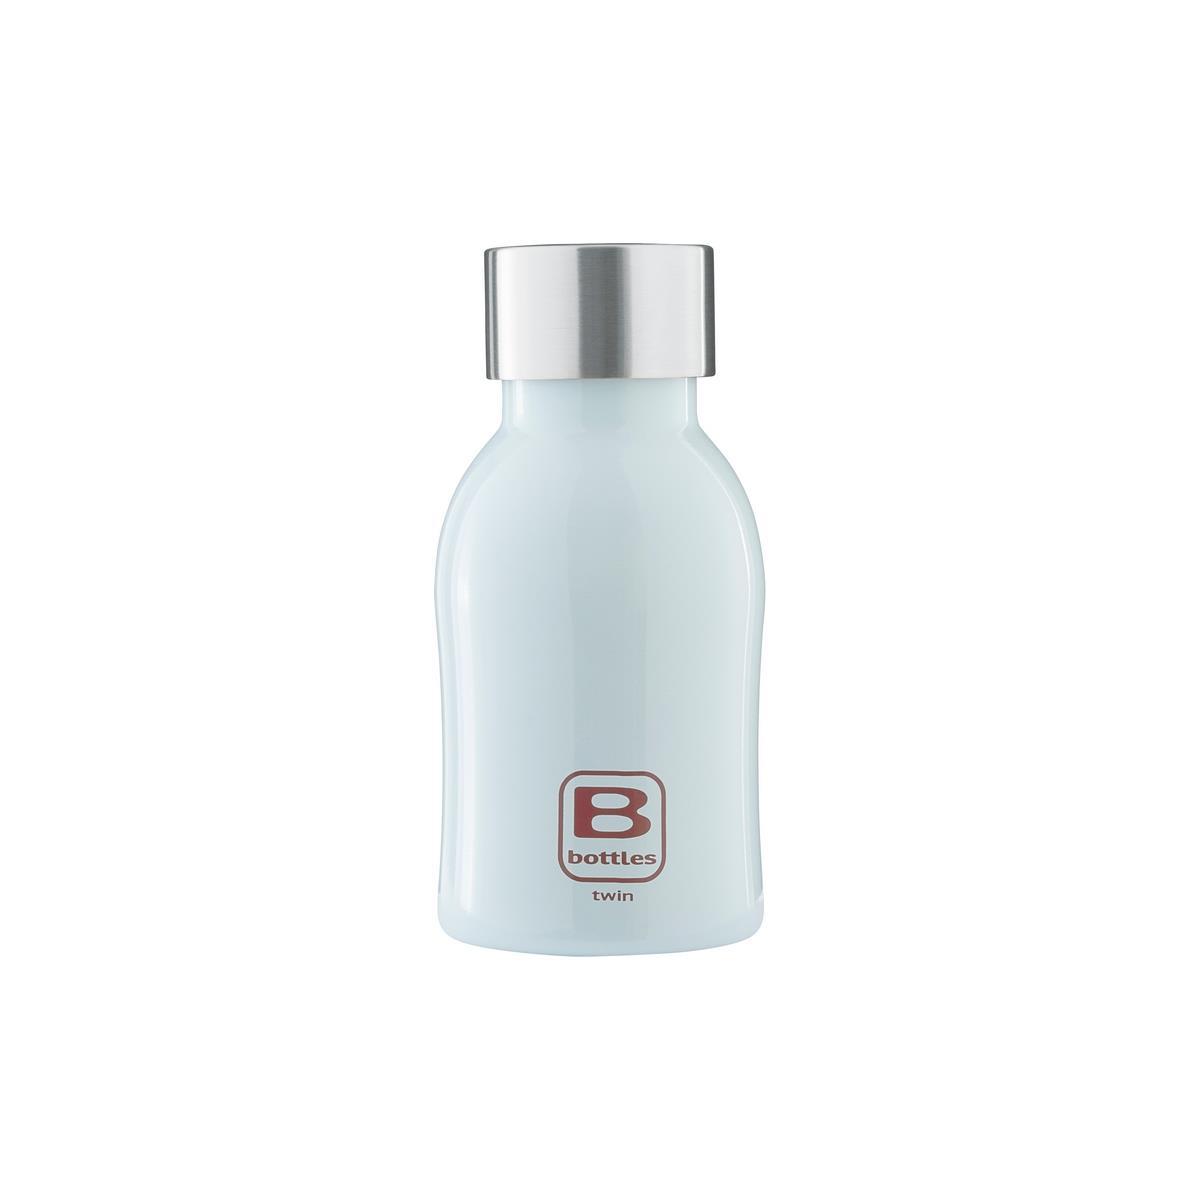 B Bottles Twin - Light Blue - 250 ml - Bottiglia Termica a doppia parete in acciaio inox 18/10